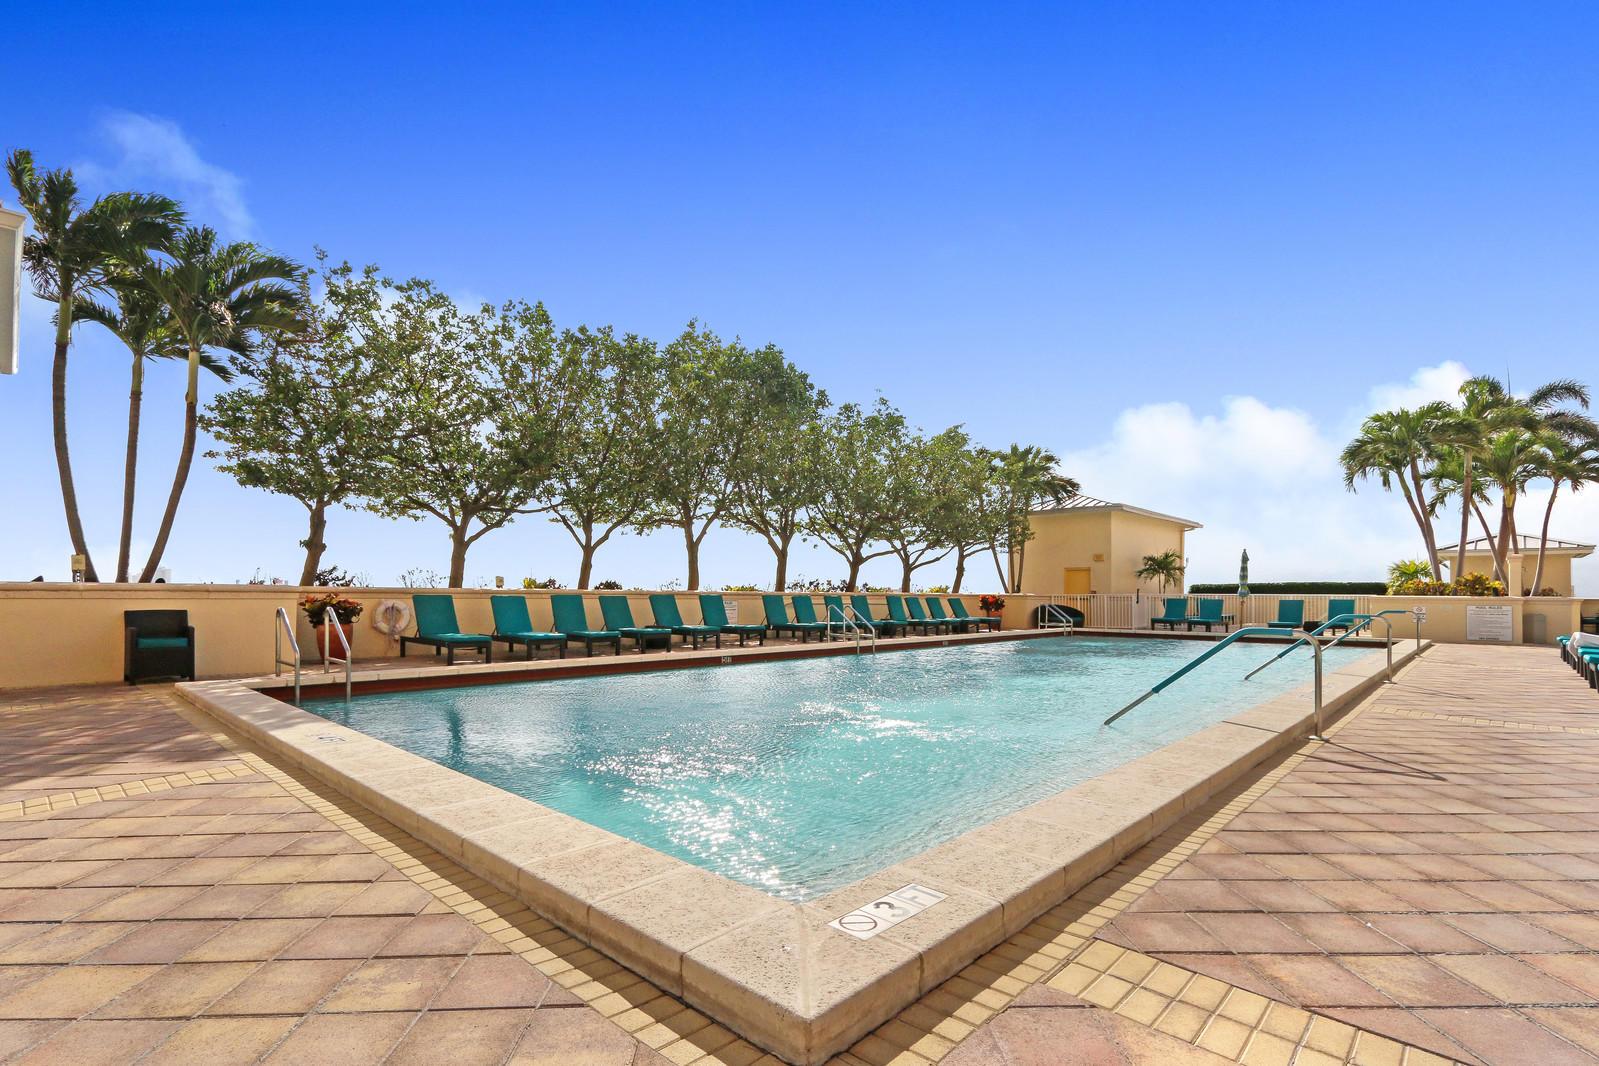 2650 Lake Shore Drive 101, West Palm Beach, Florida 33404, 2 Bedrooms Bedrooms, ,2 BathroomsBathrooms,F,Condominium,Lake Shore,RX-10413664